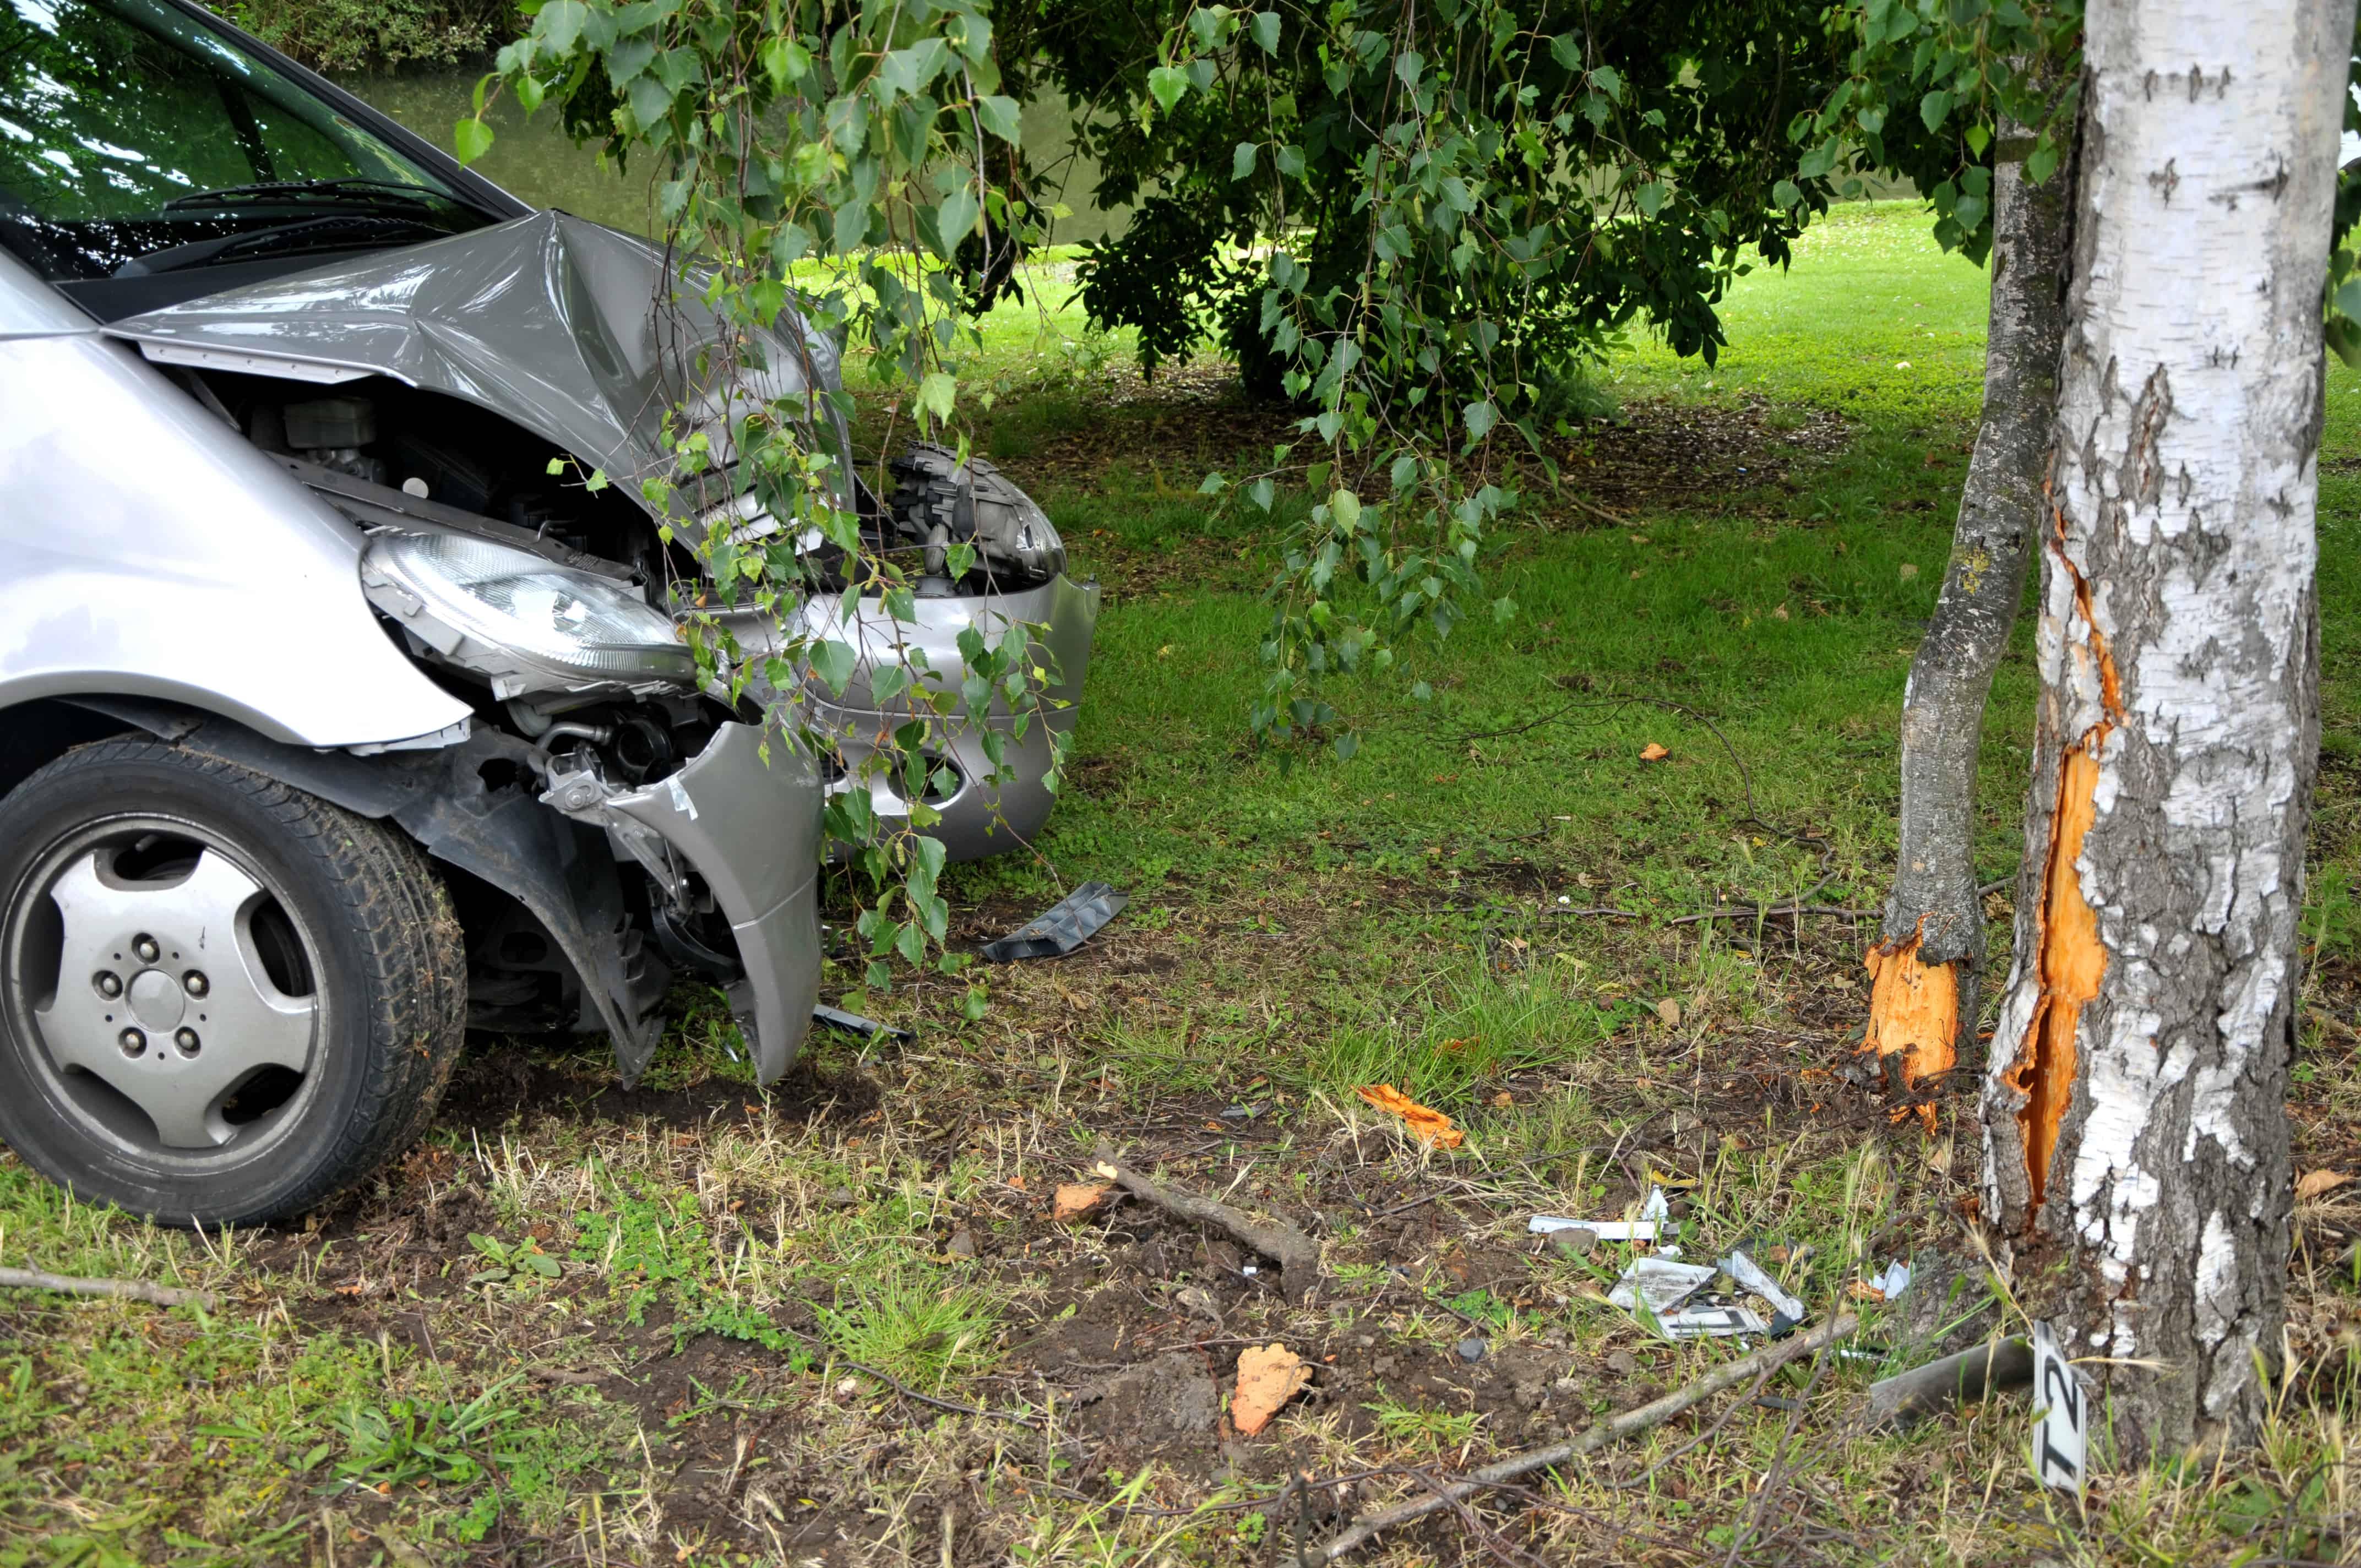 Jason Atonio, Scott Poloai Injured in Single-Vehicle Crash